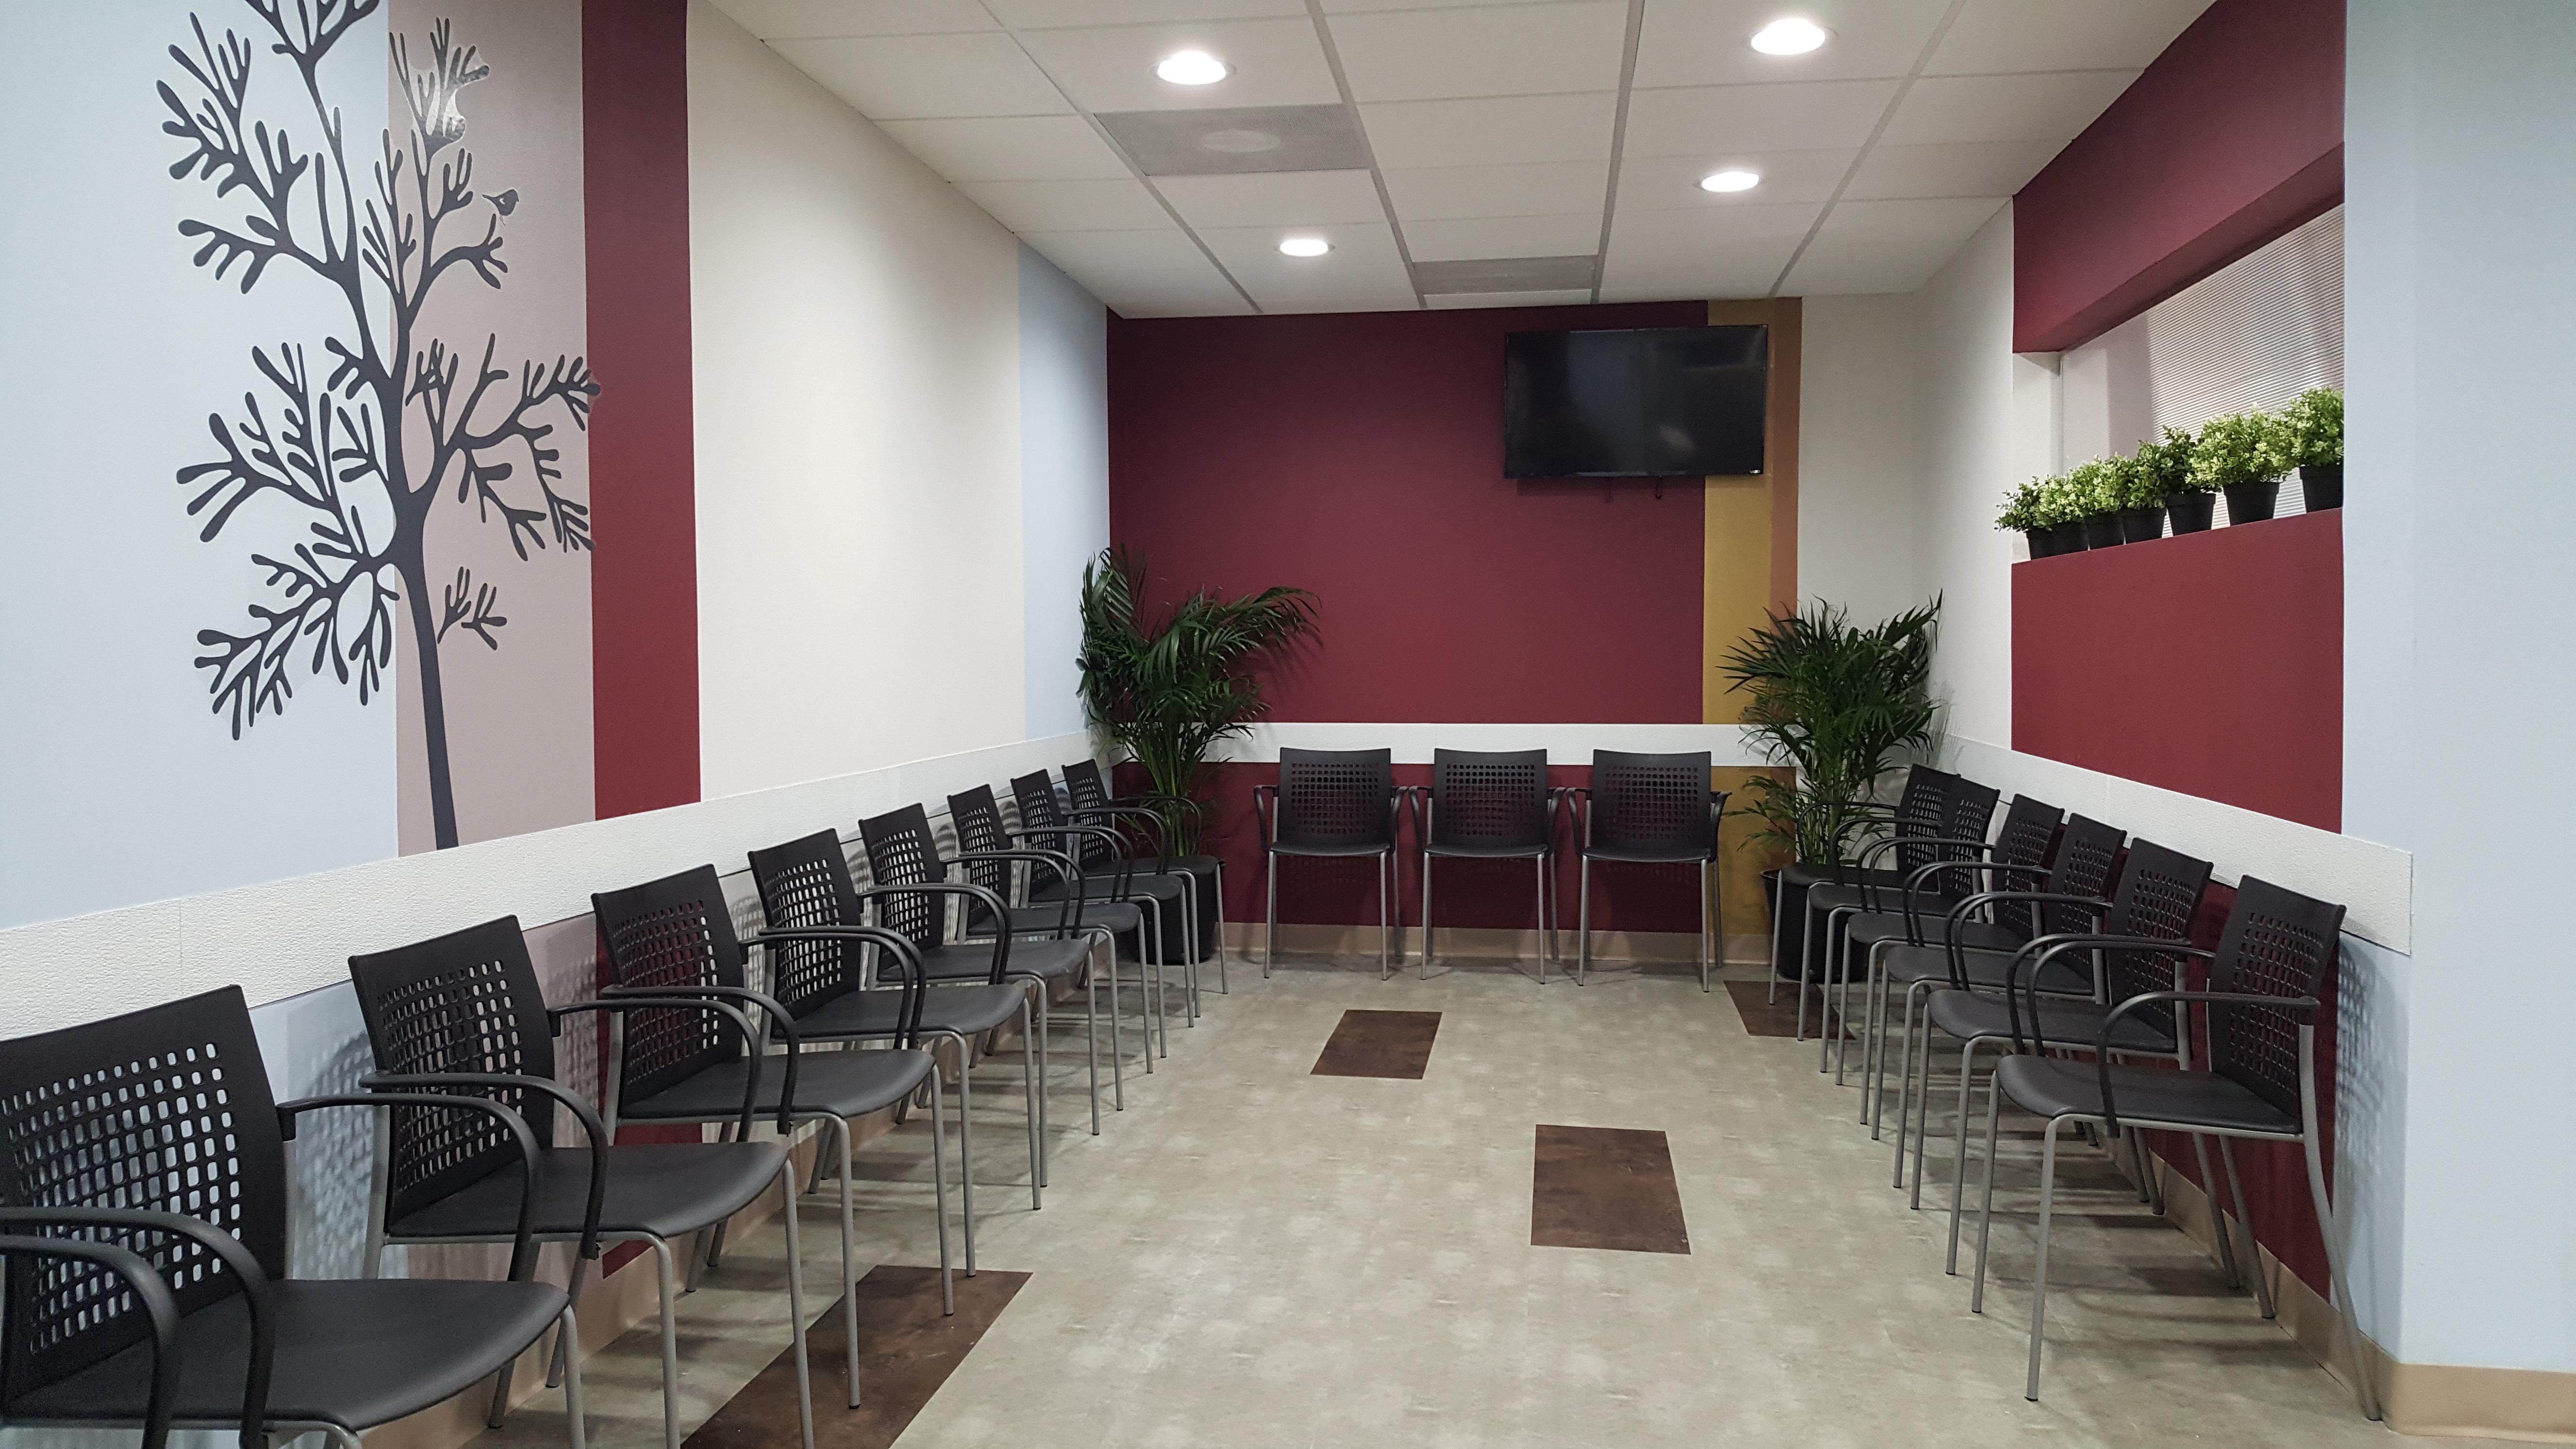 Community Health Of South Florida Inc (CHI) South Miami